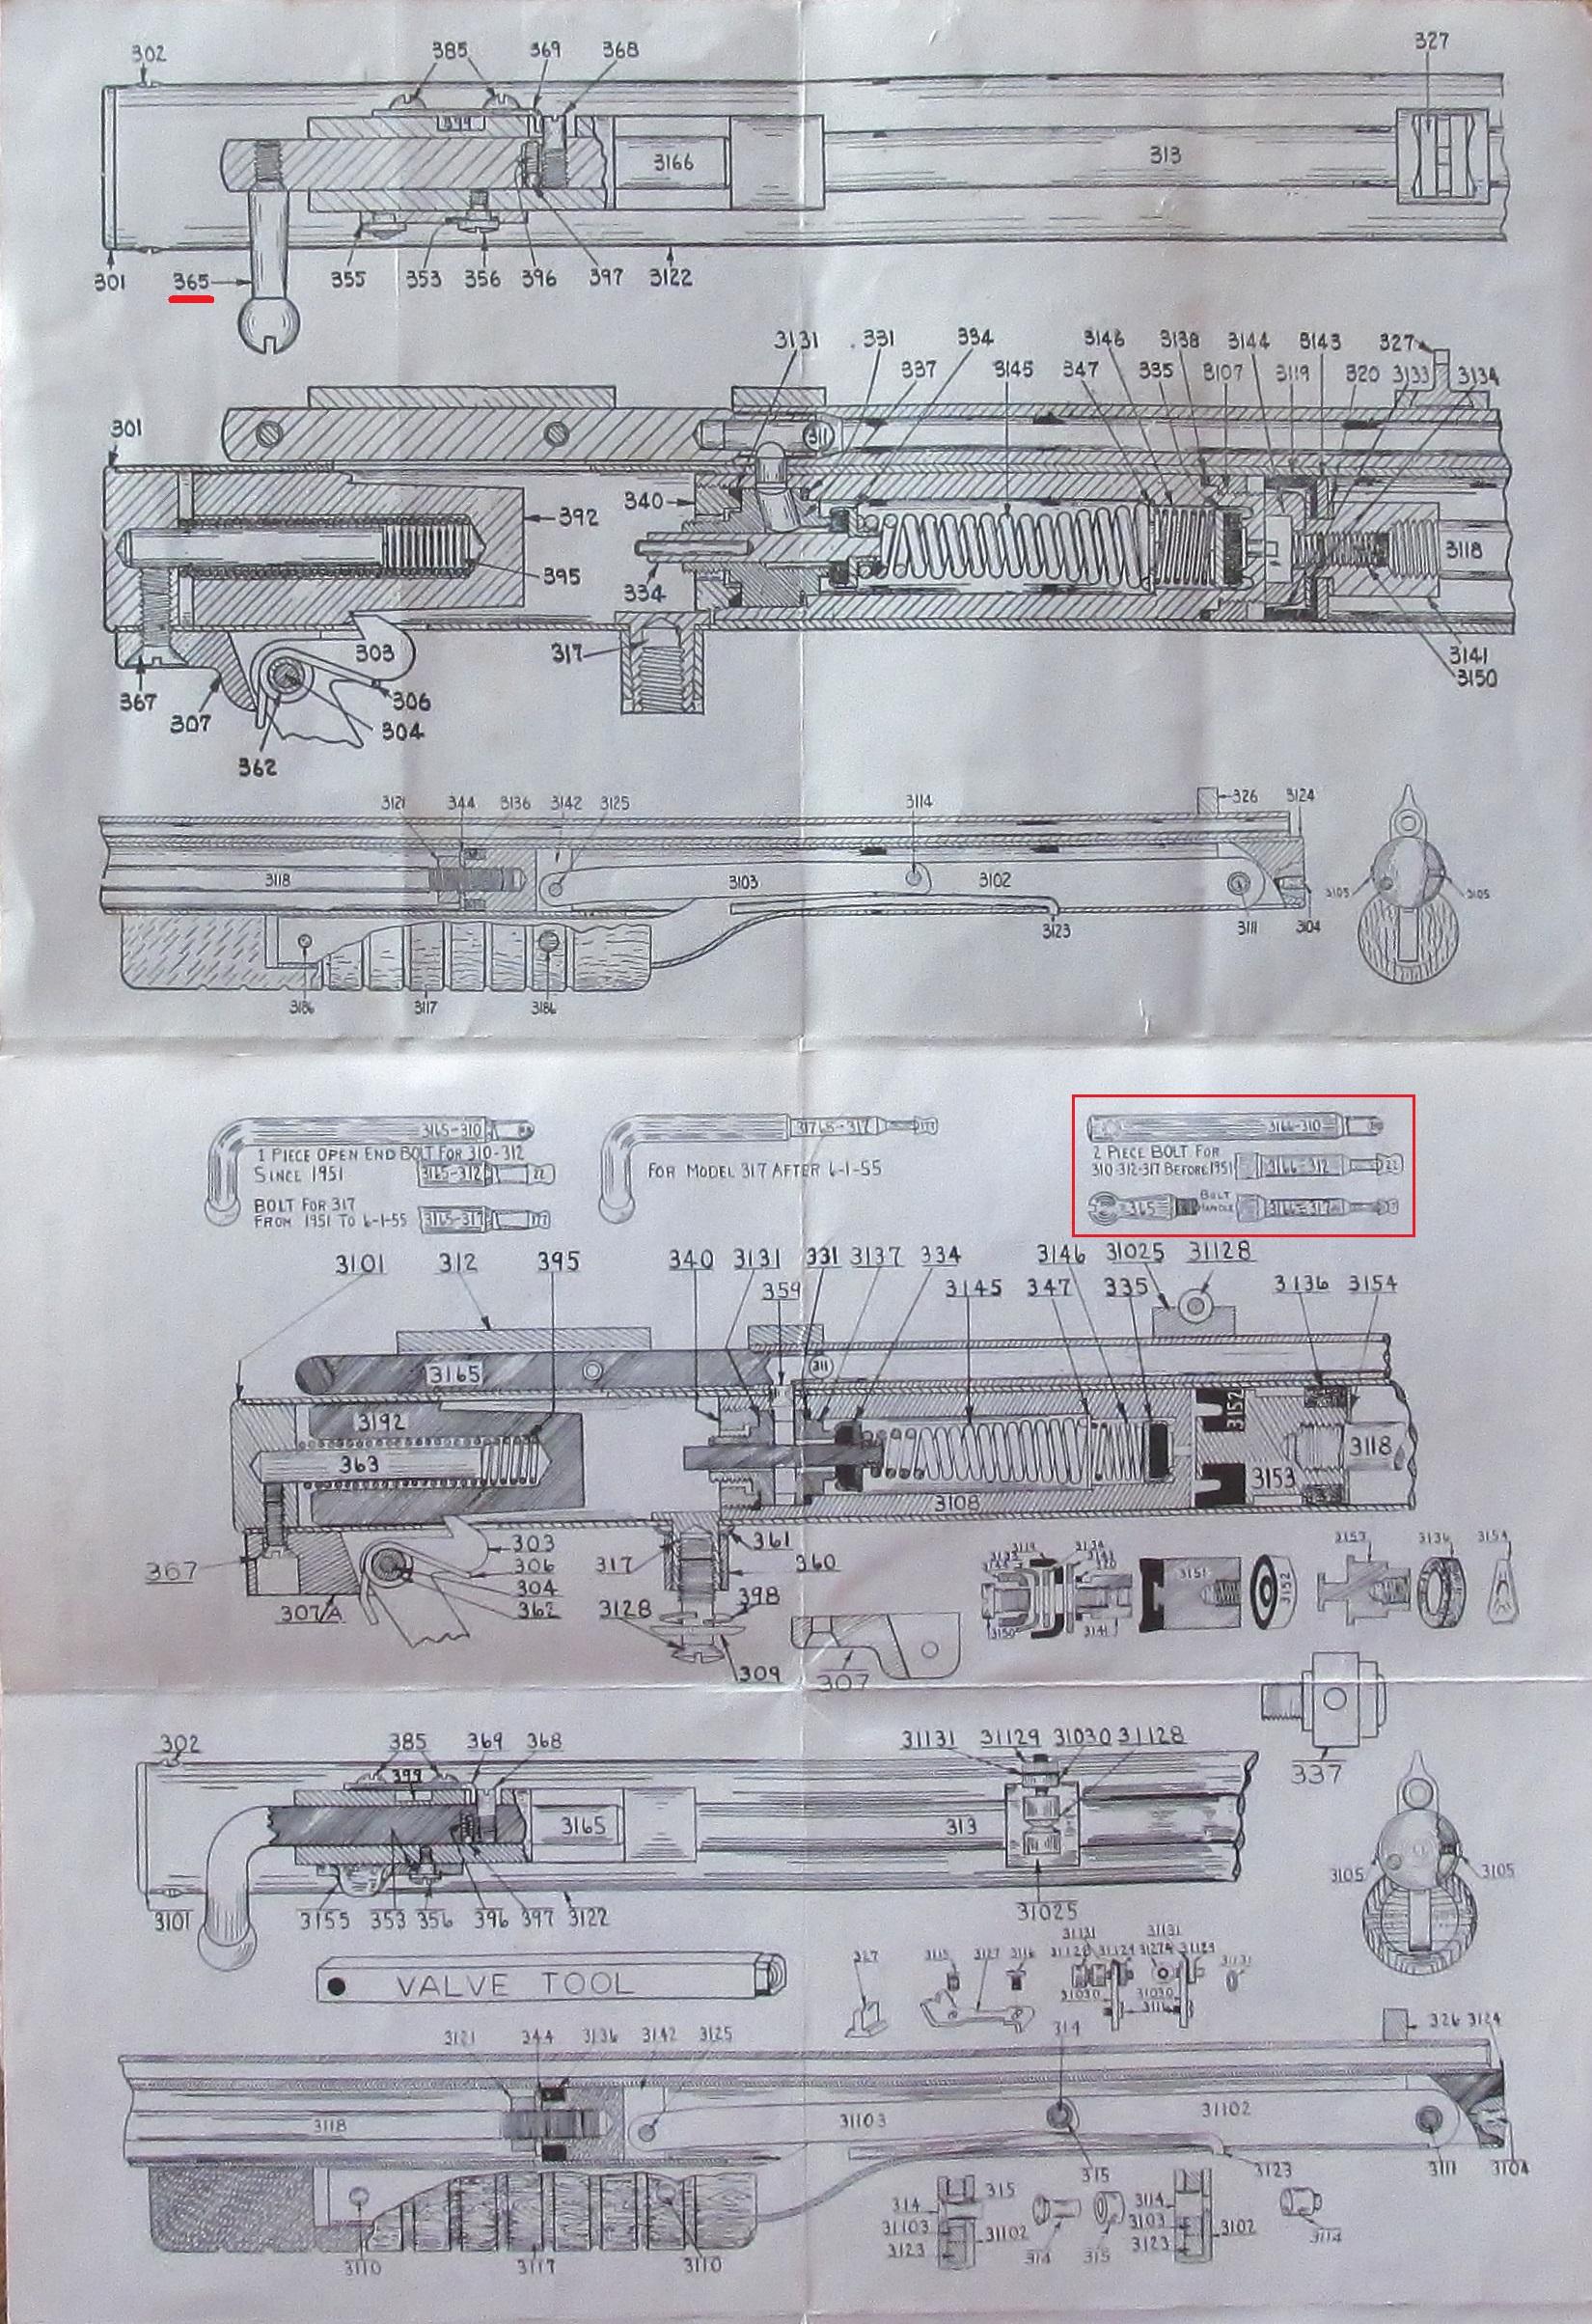 1s-Benji 312.JPG